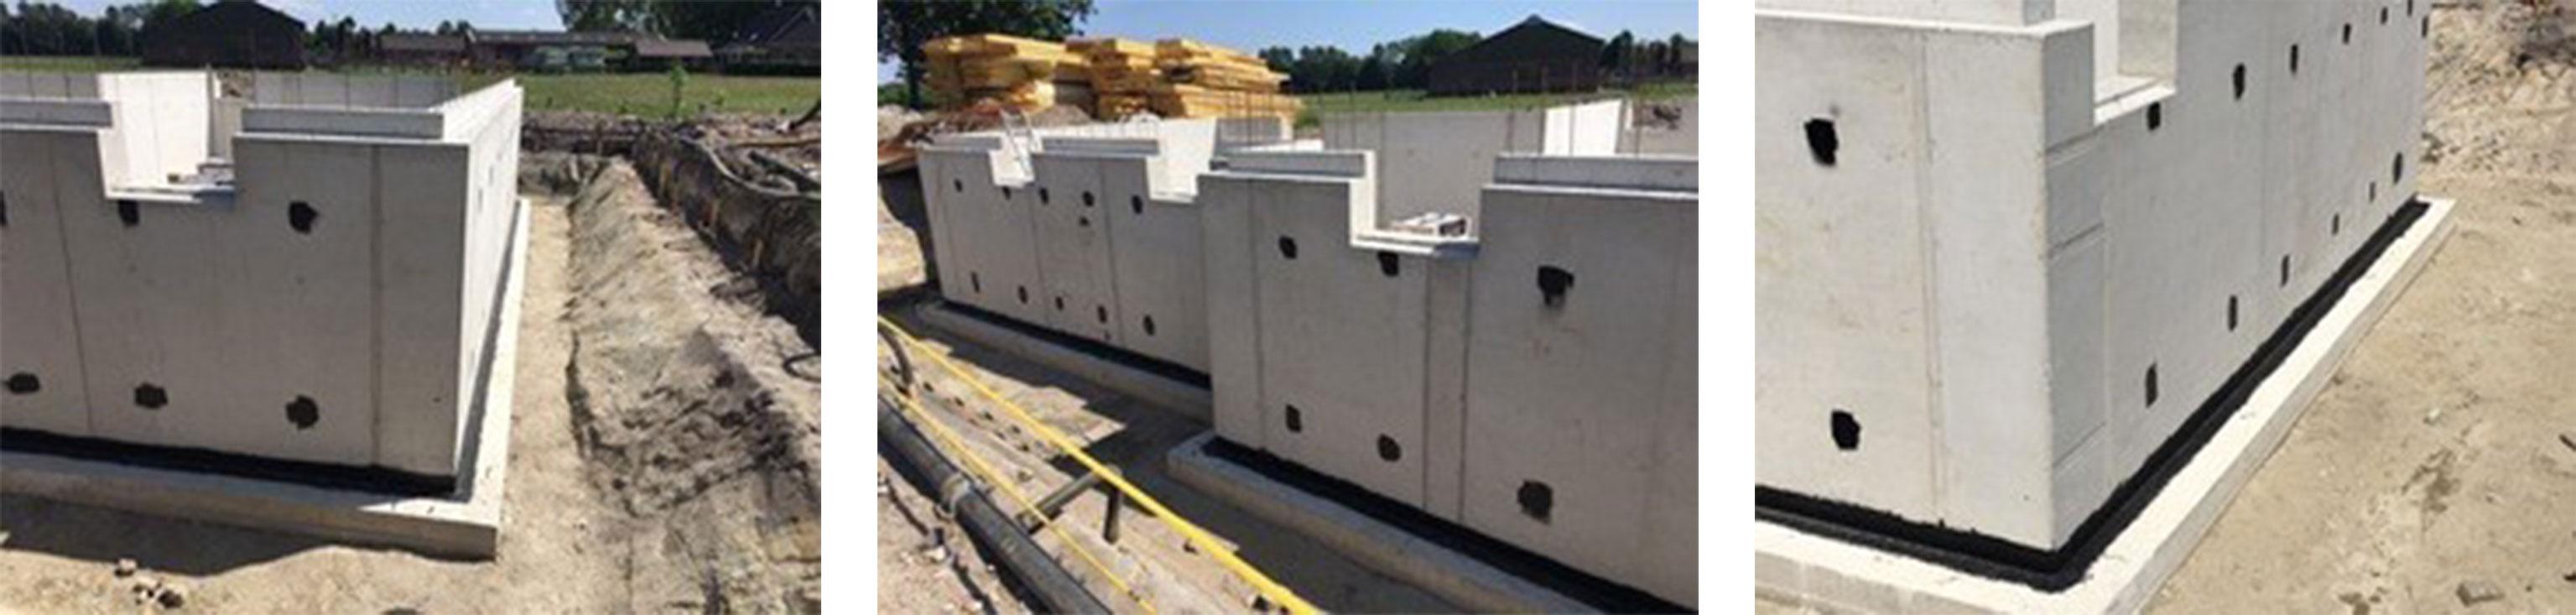 Foundation-wall-waterproofing